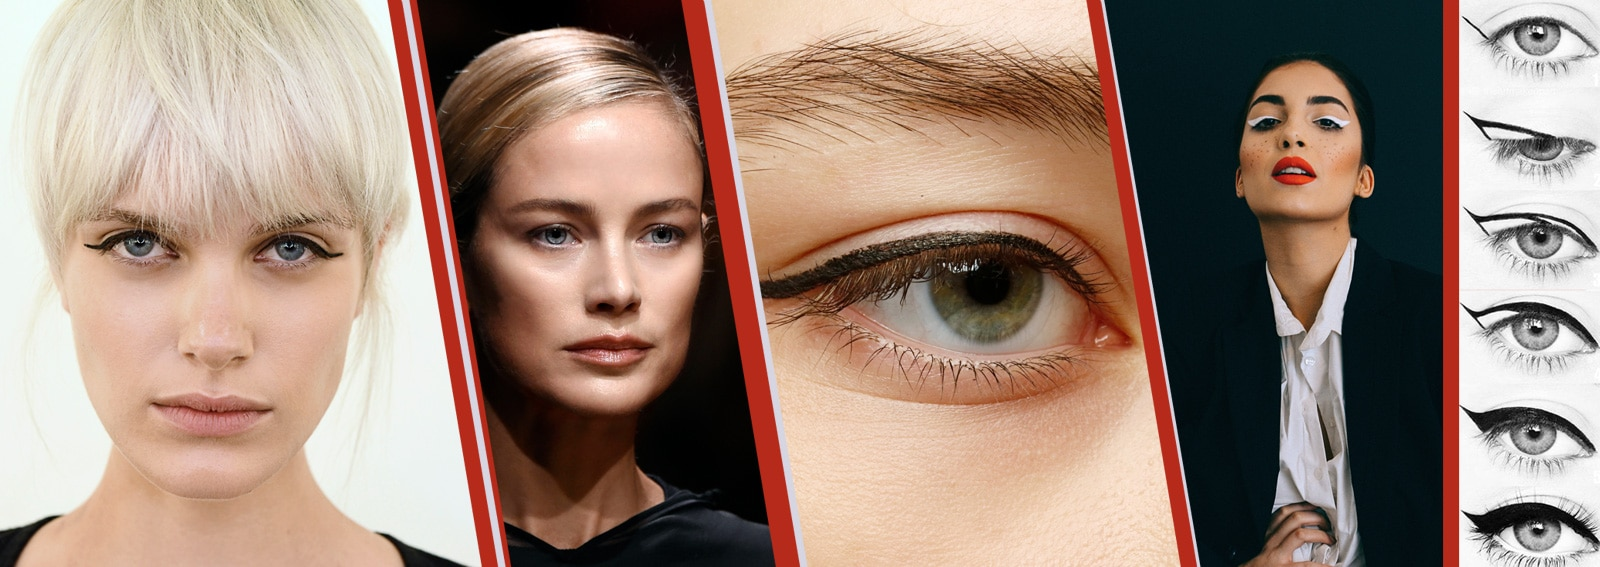 DESKTOP_5-trucchi-per-applicare-bene-l'eyeliner-che-ogni-donna-dovrebbe-sapere